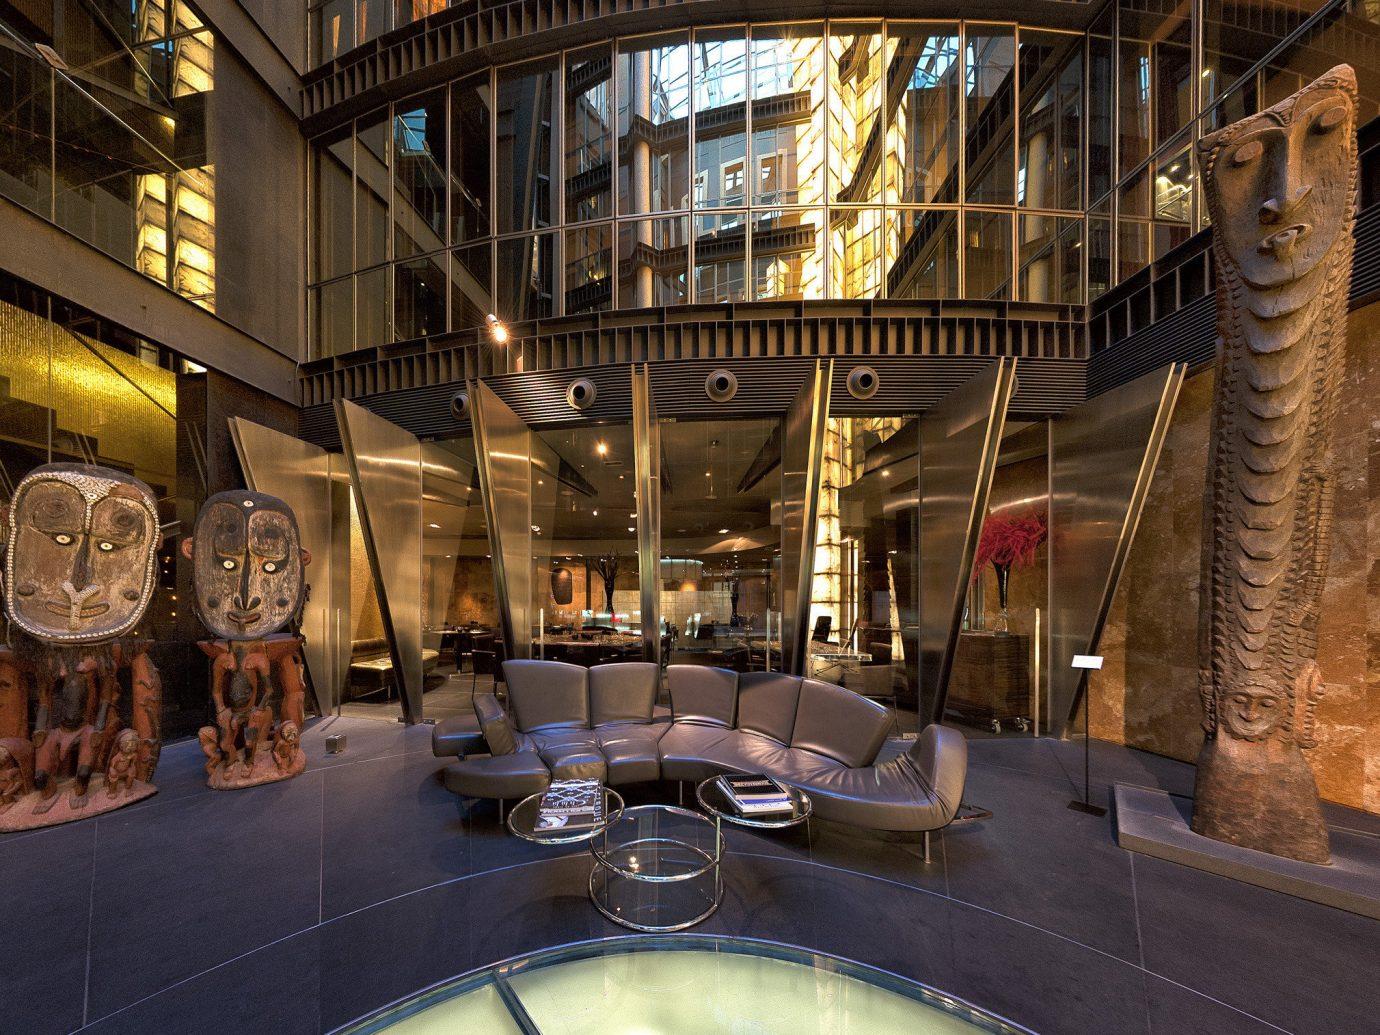 Hotels building estate interior design Lobby tourist attraction